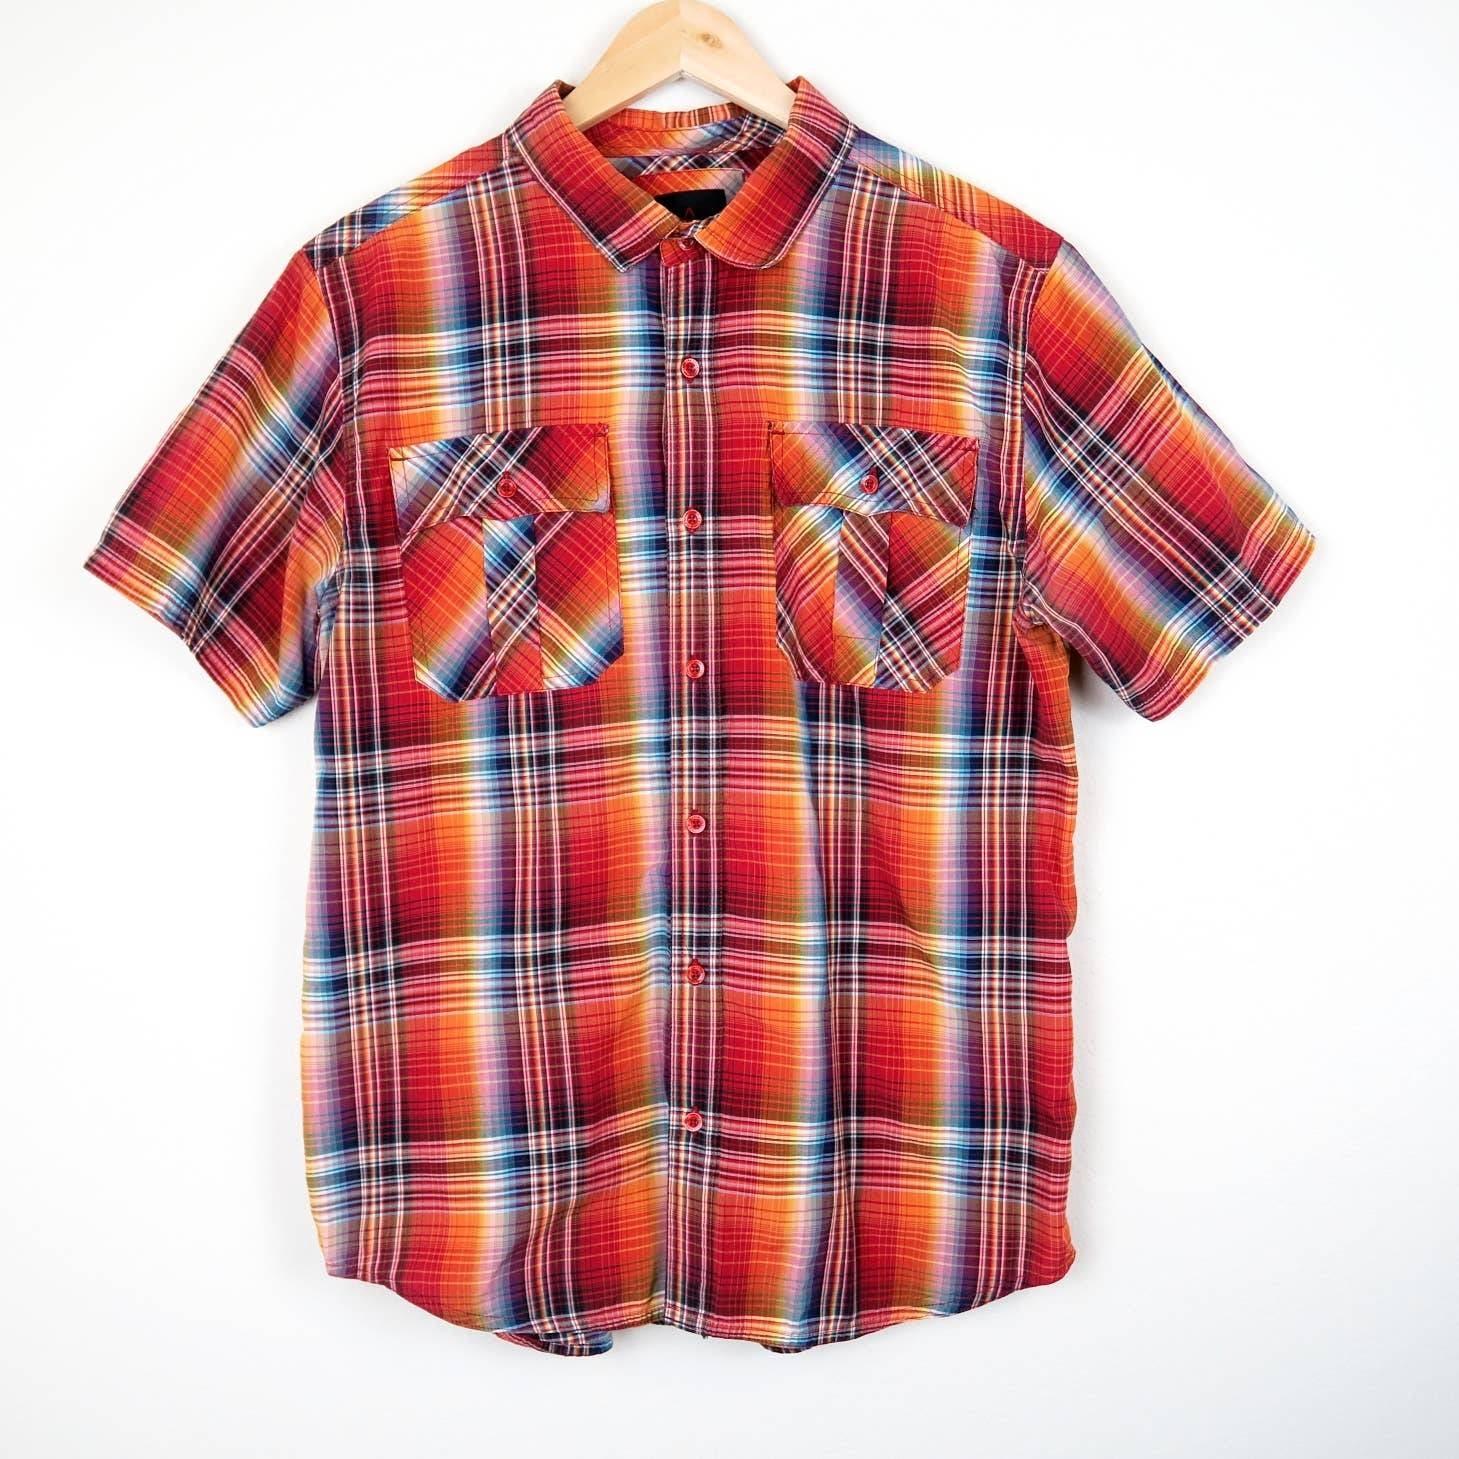 Prana Rainbow Plaid Button Front Shirt